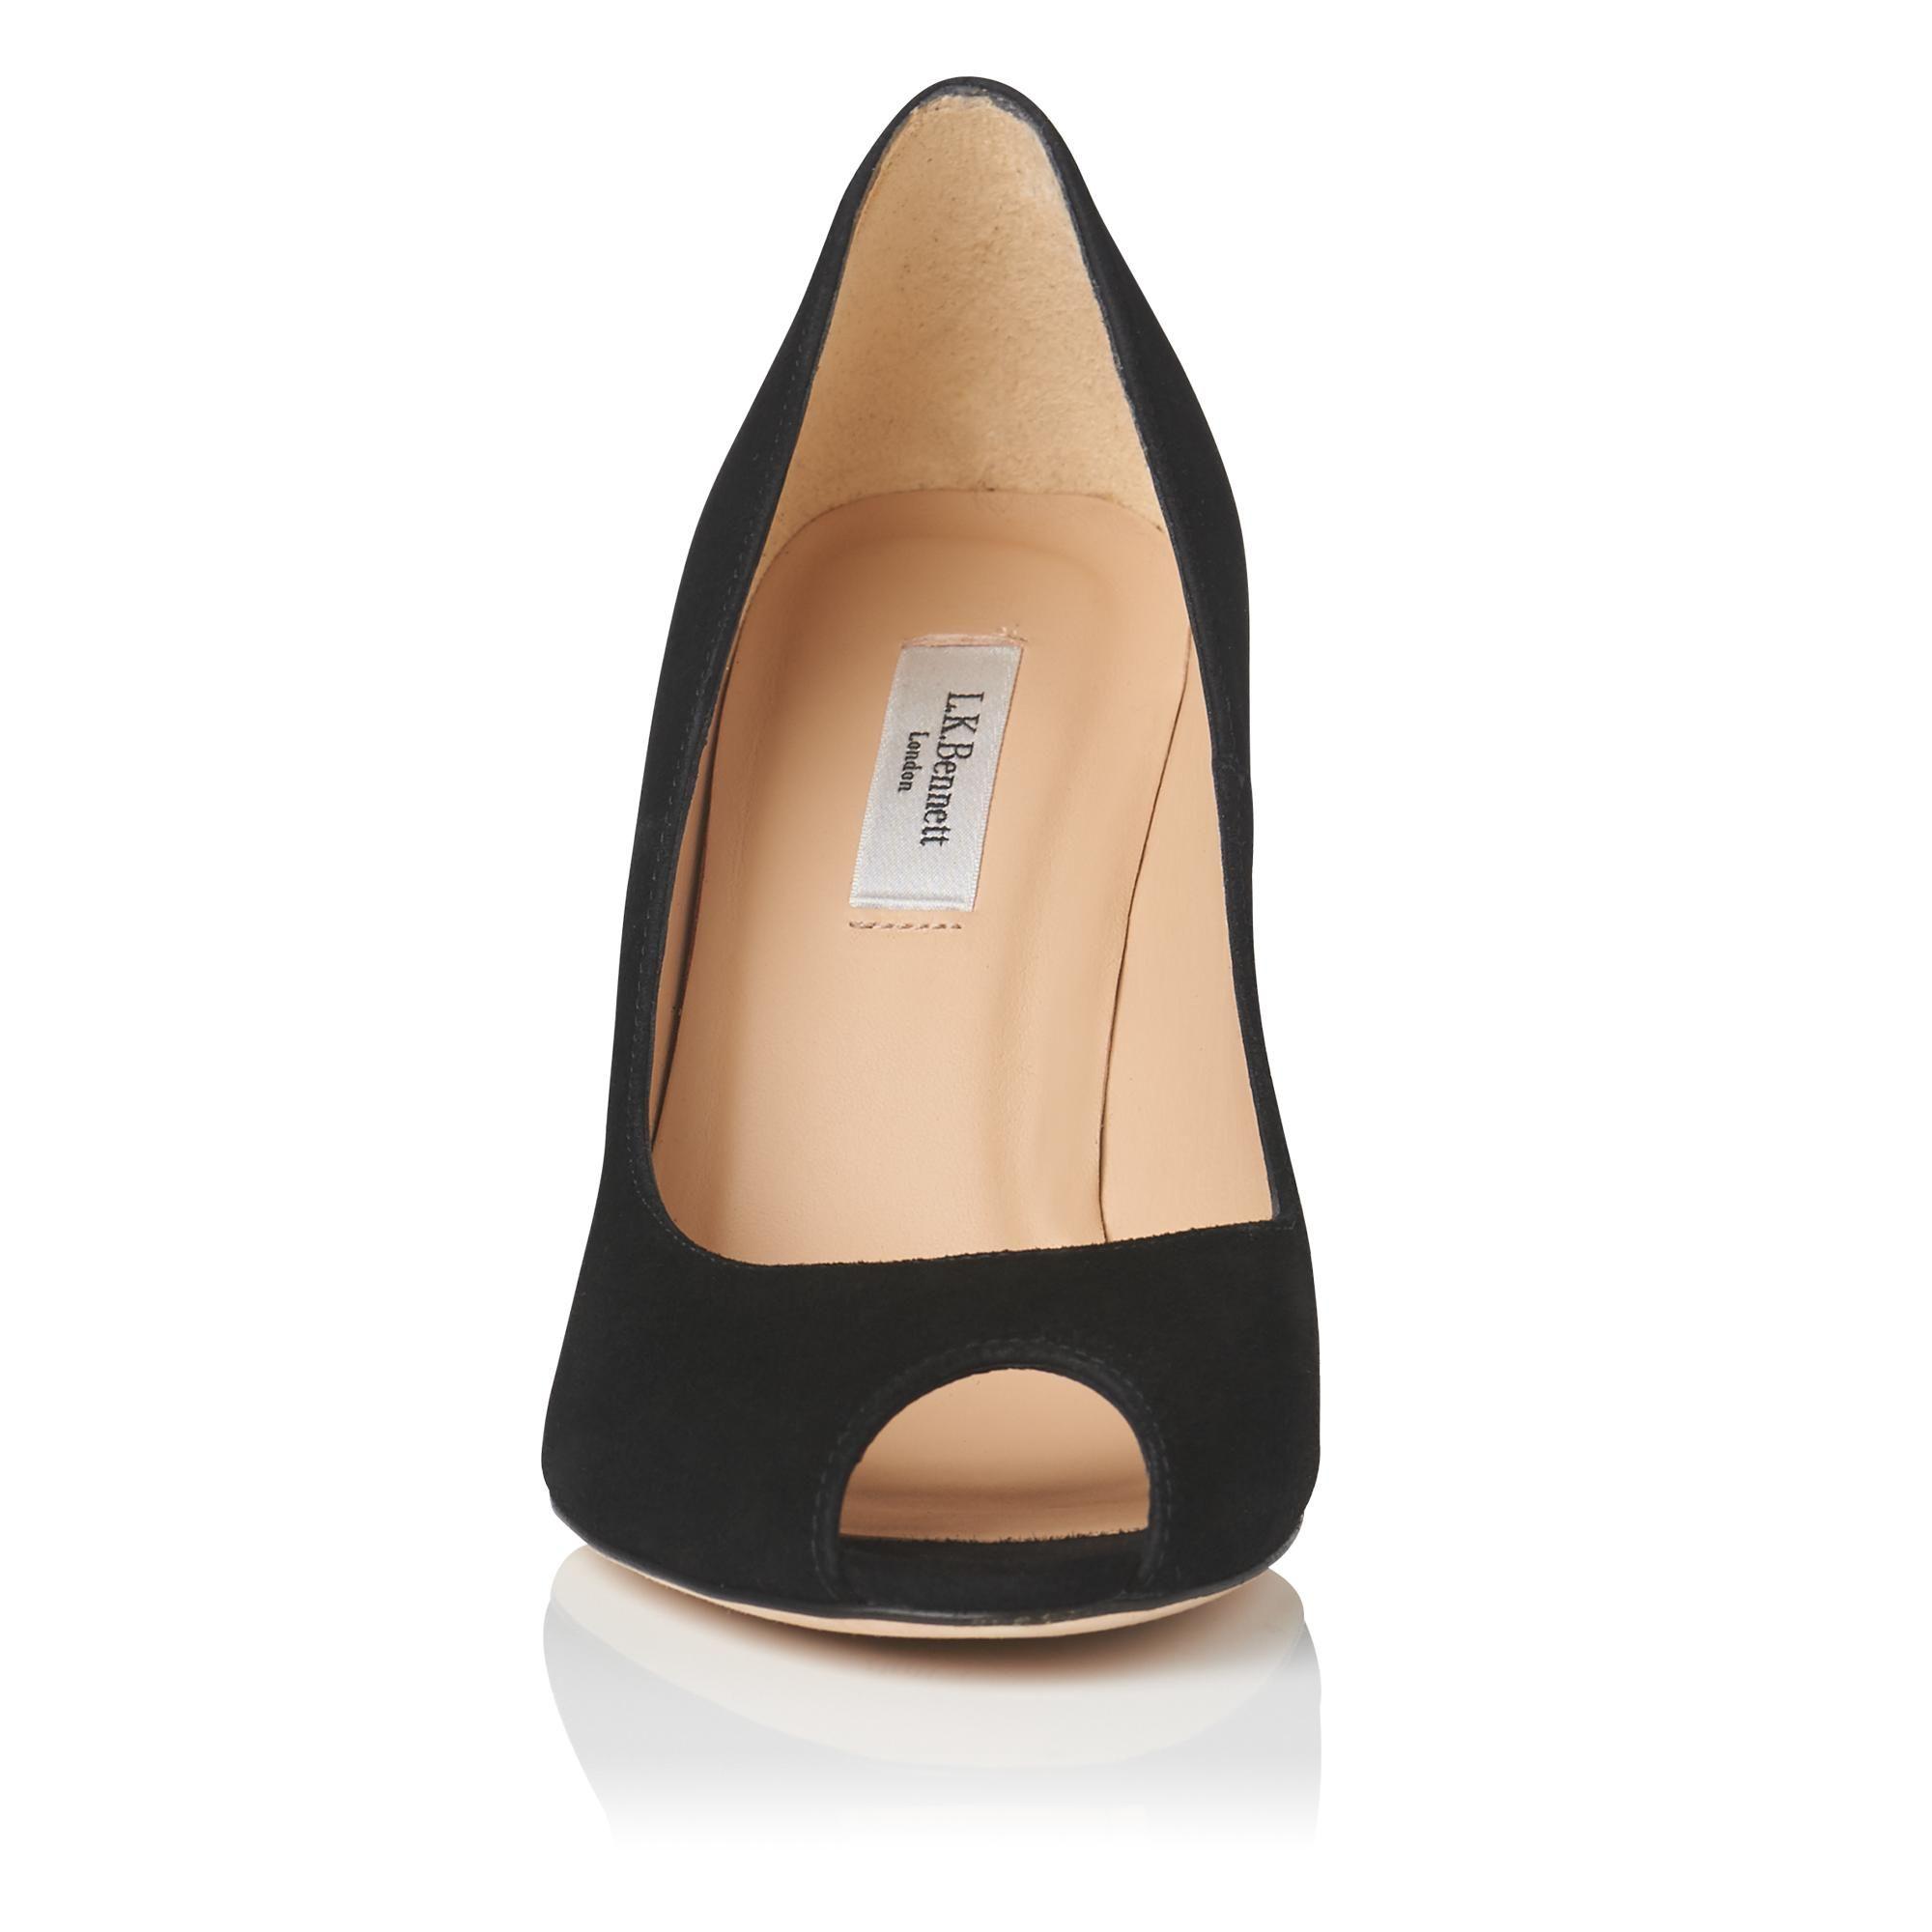 LK Bennett black suede with nude leather trim peep toe